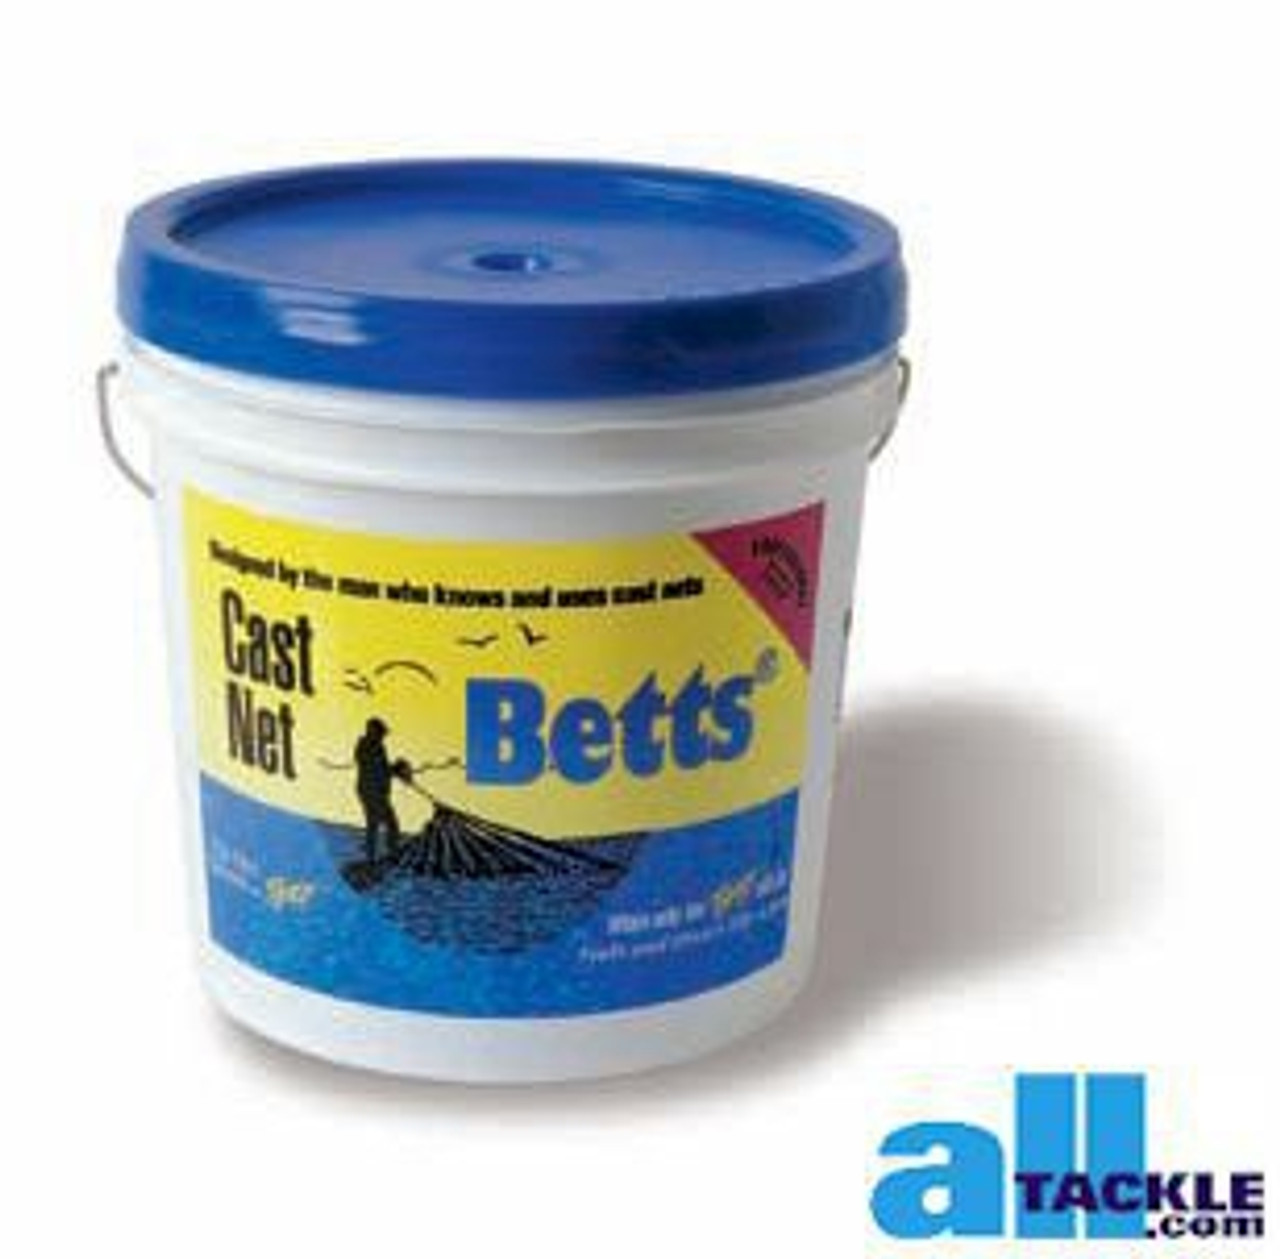 "Betts 30-10 Morada Series Cast Net 10 ft environ 3.05 m radius x 1//2/"" Mesh 25719"